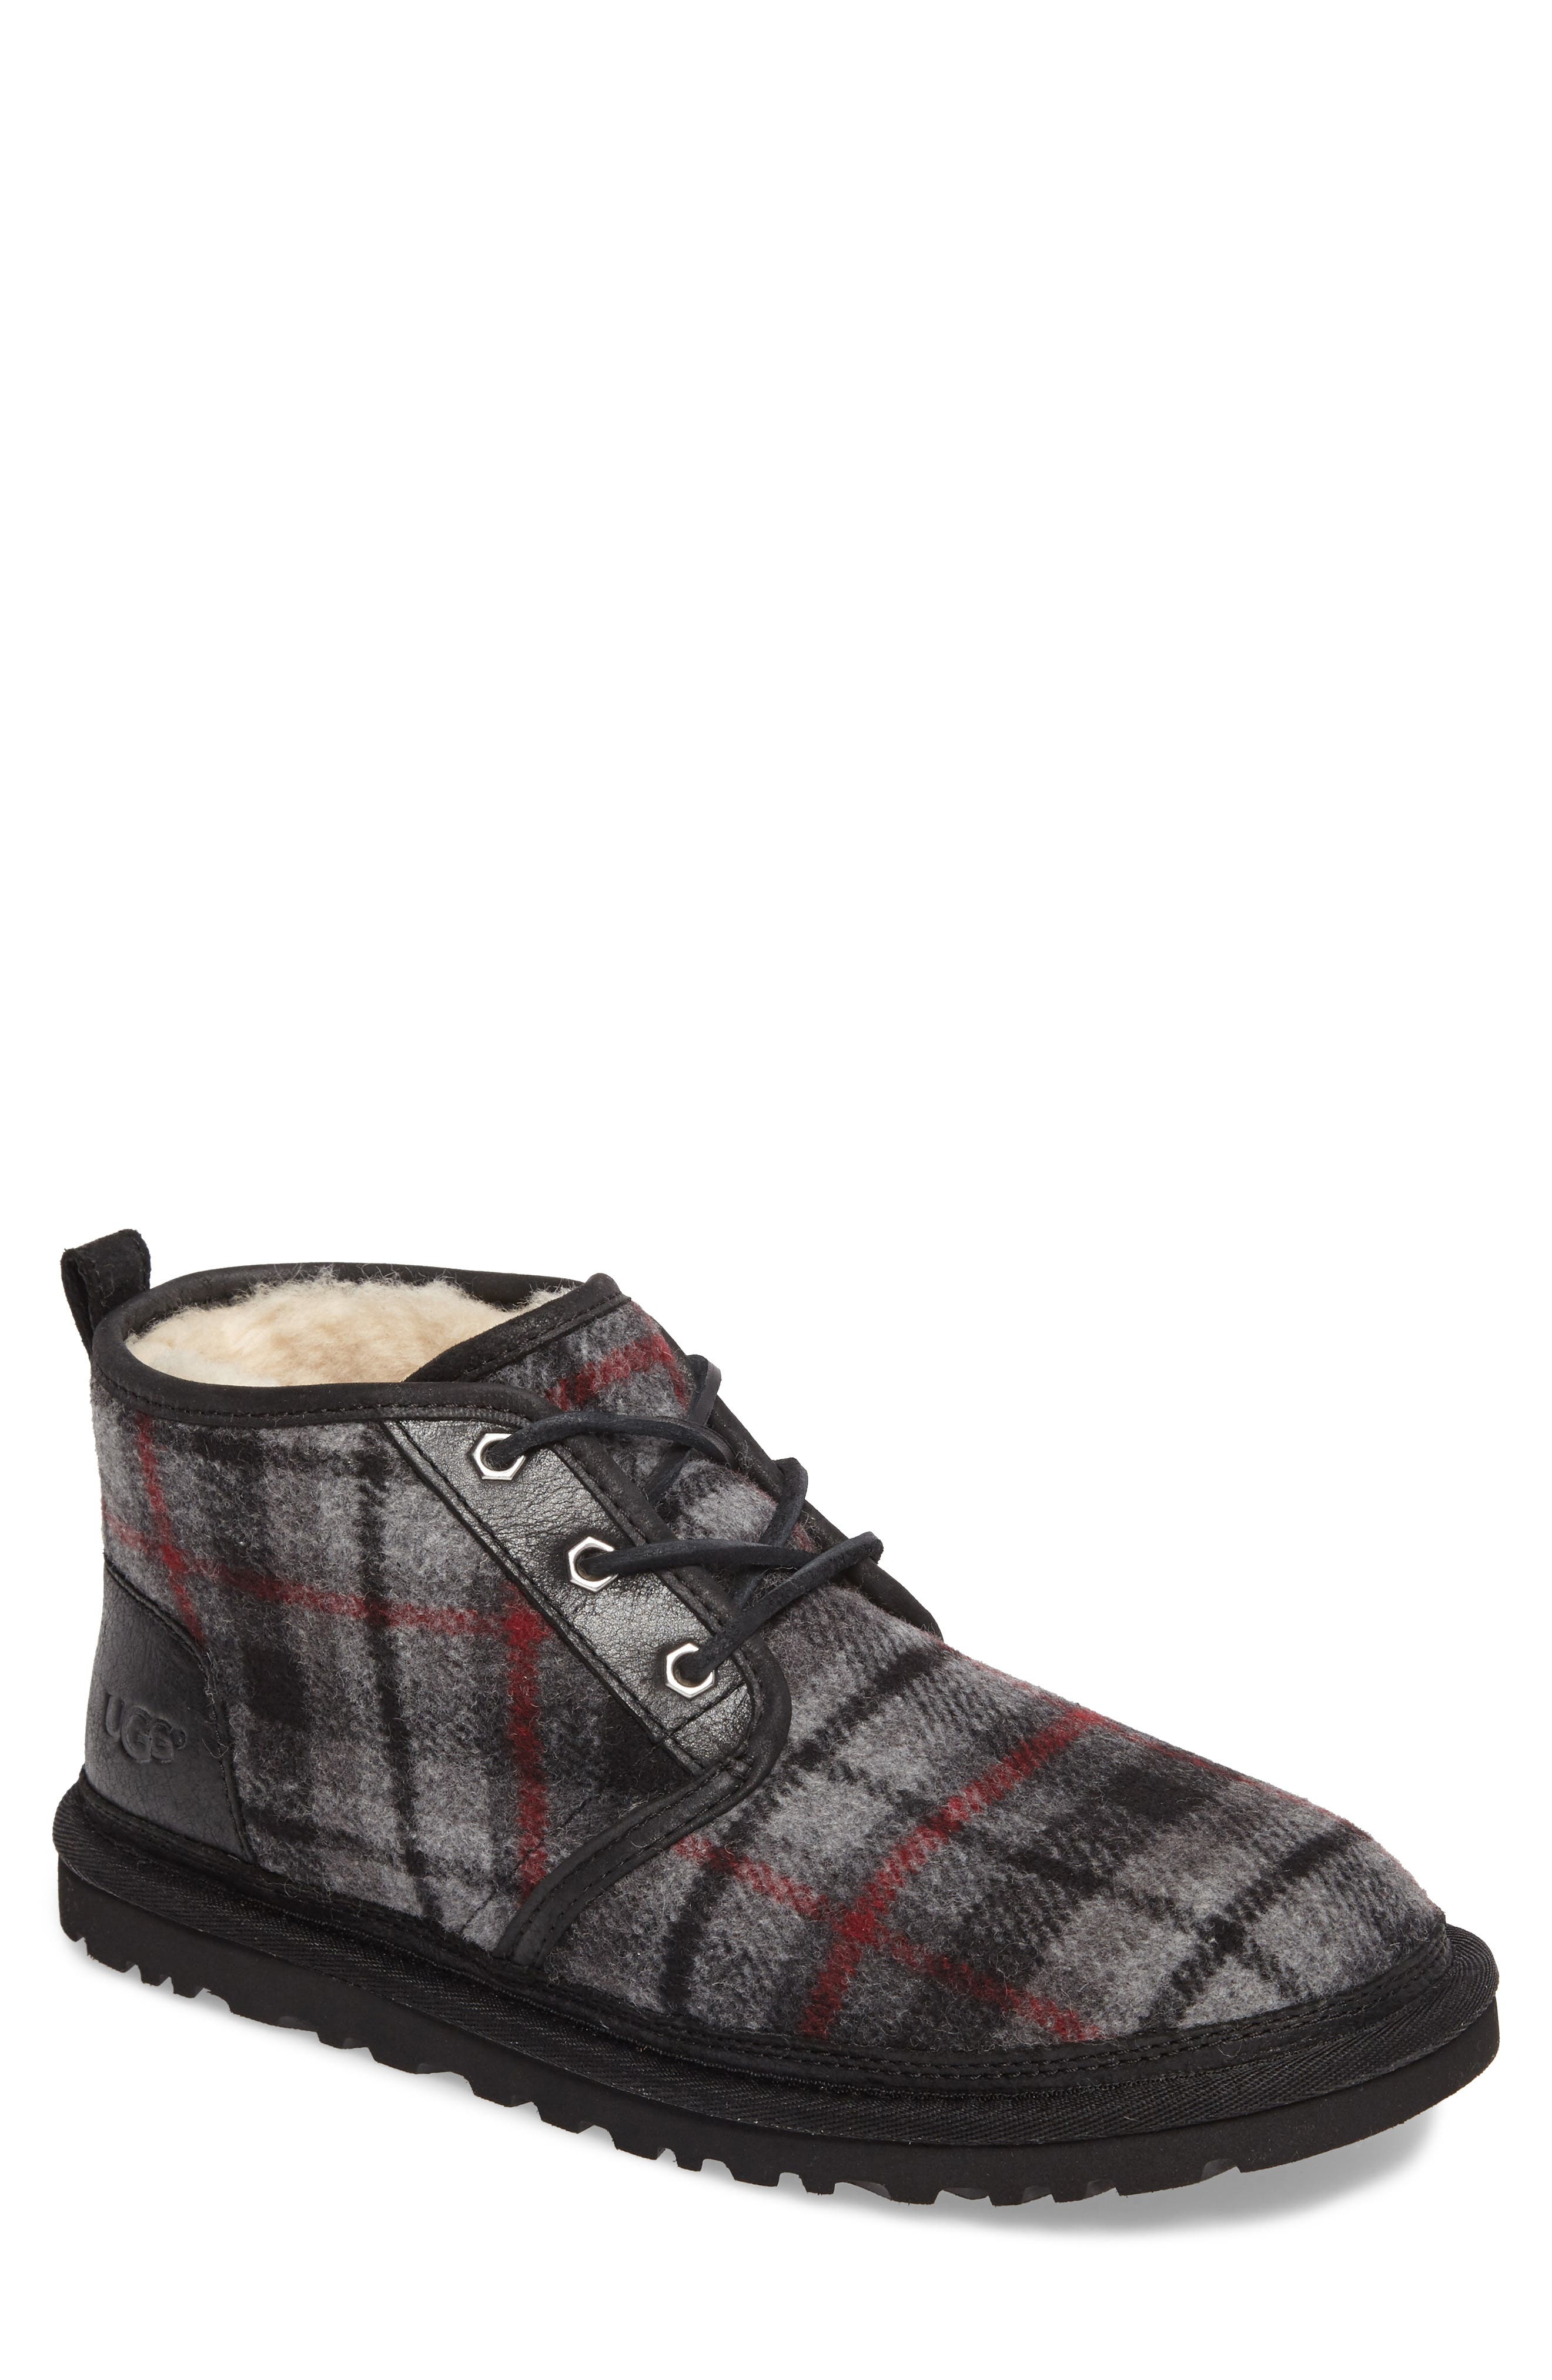 Neumel Chukka Boot,                         Main,                         color, 649